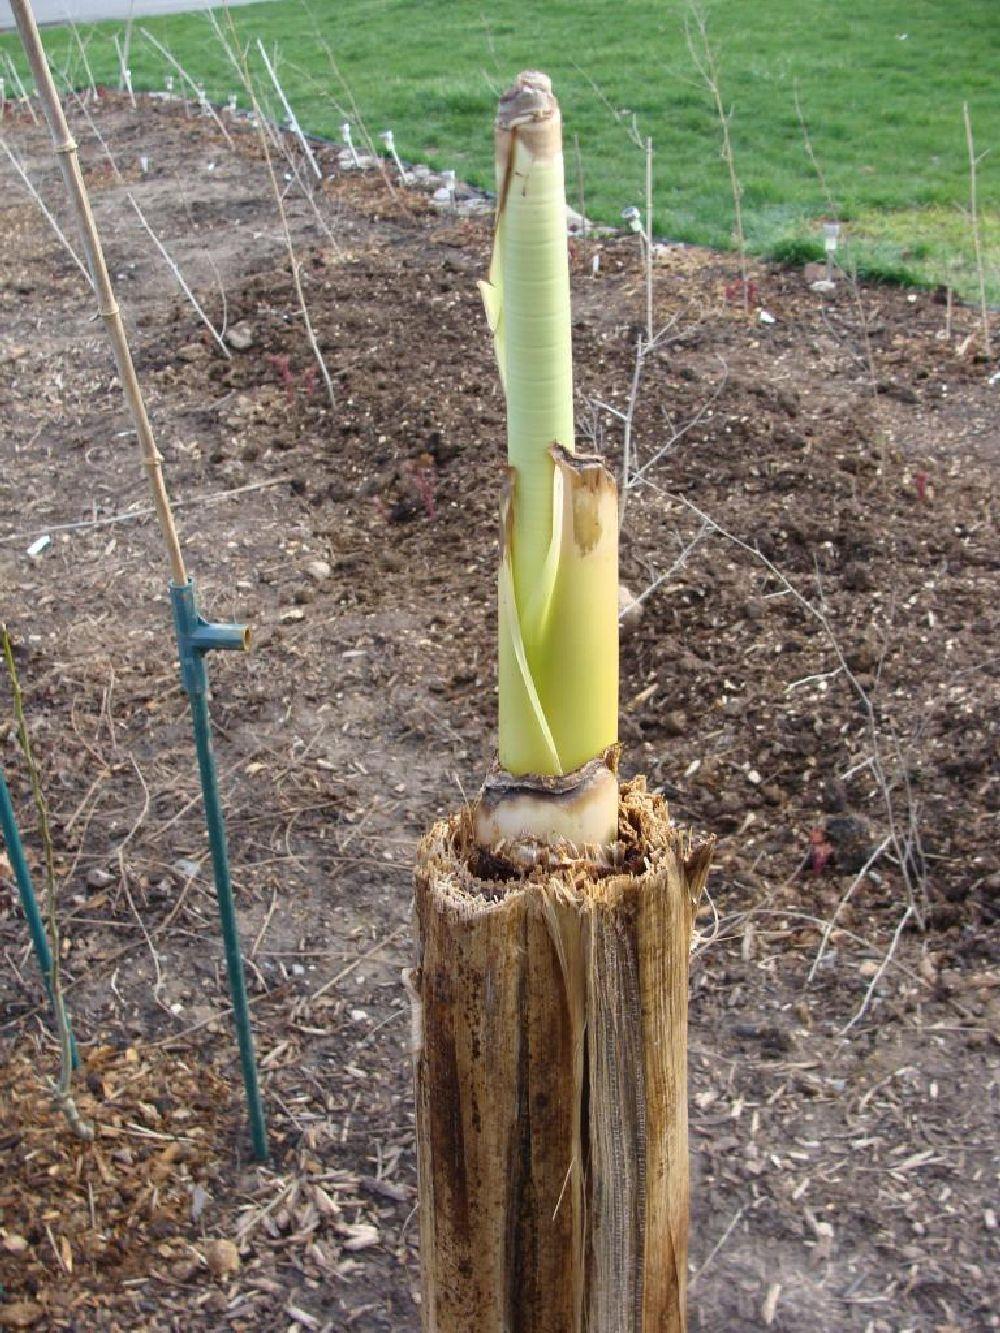 adelaparvu.com despre bananier plantat in Romania, Text Carli Marian, in Foto bananier Musa basjoo (8)